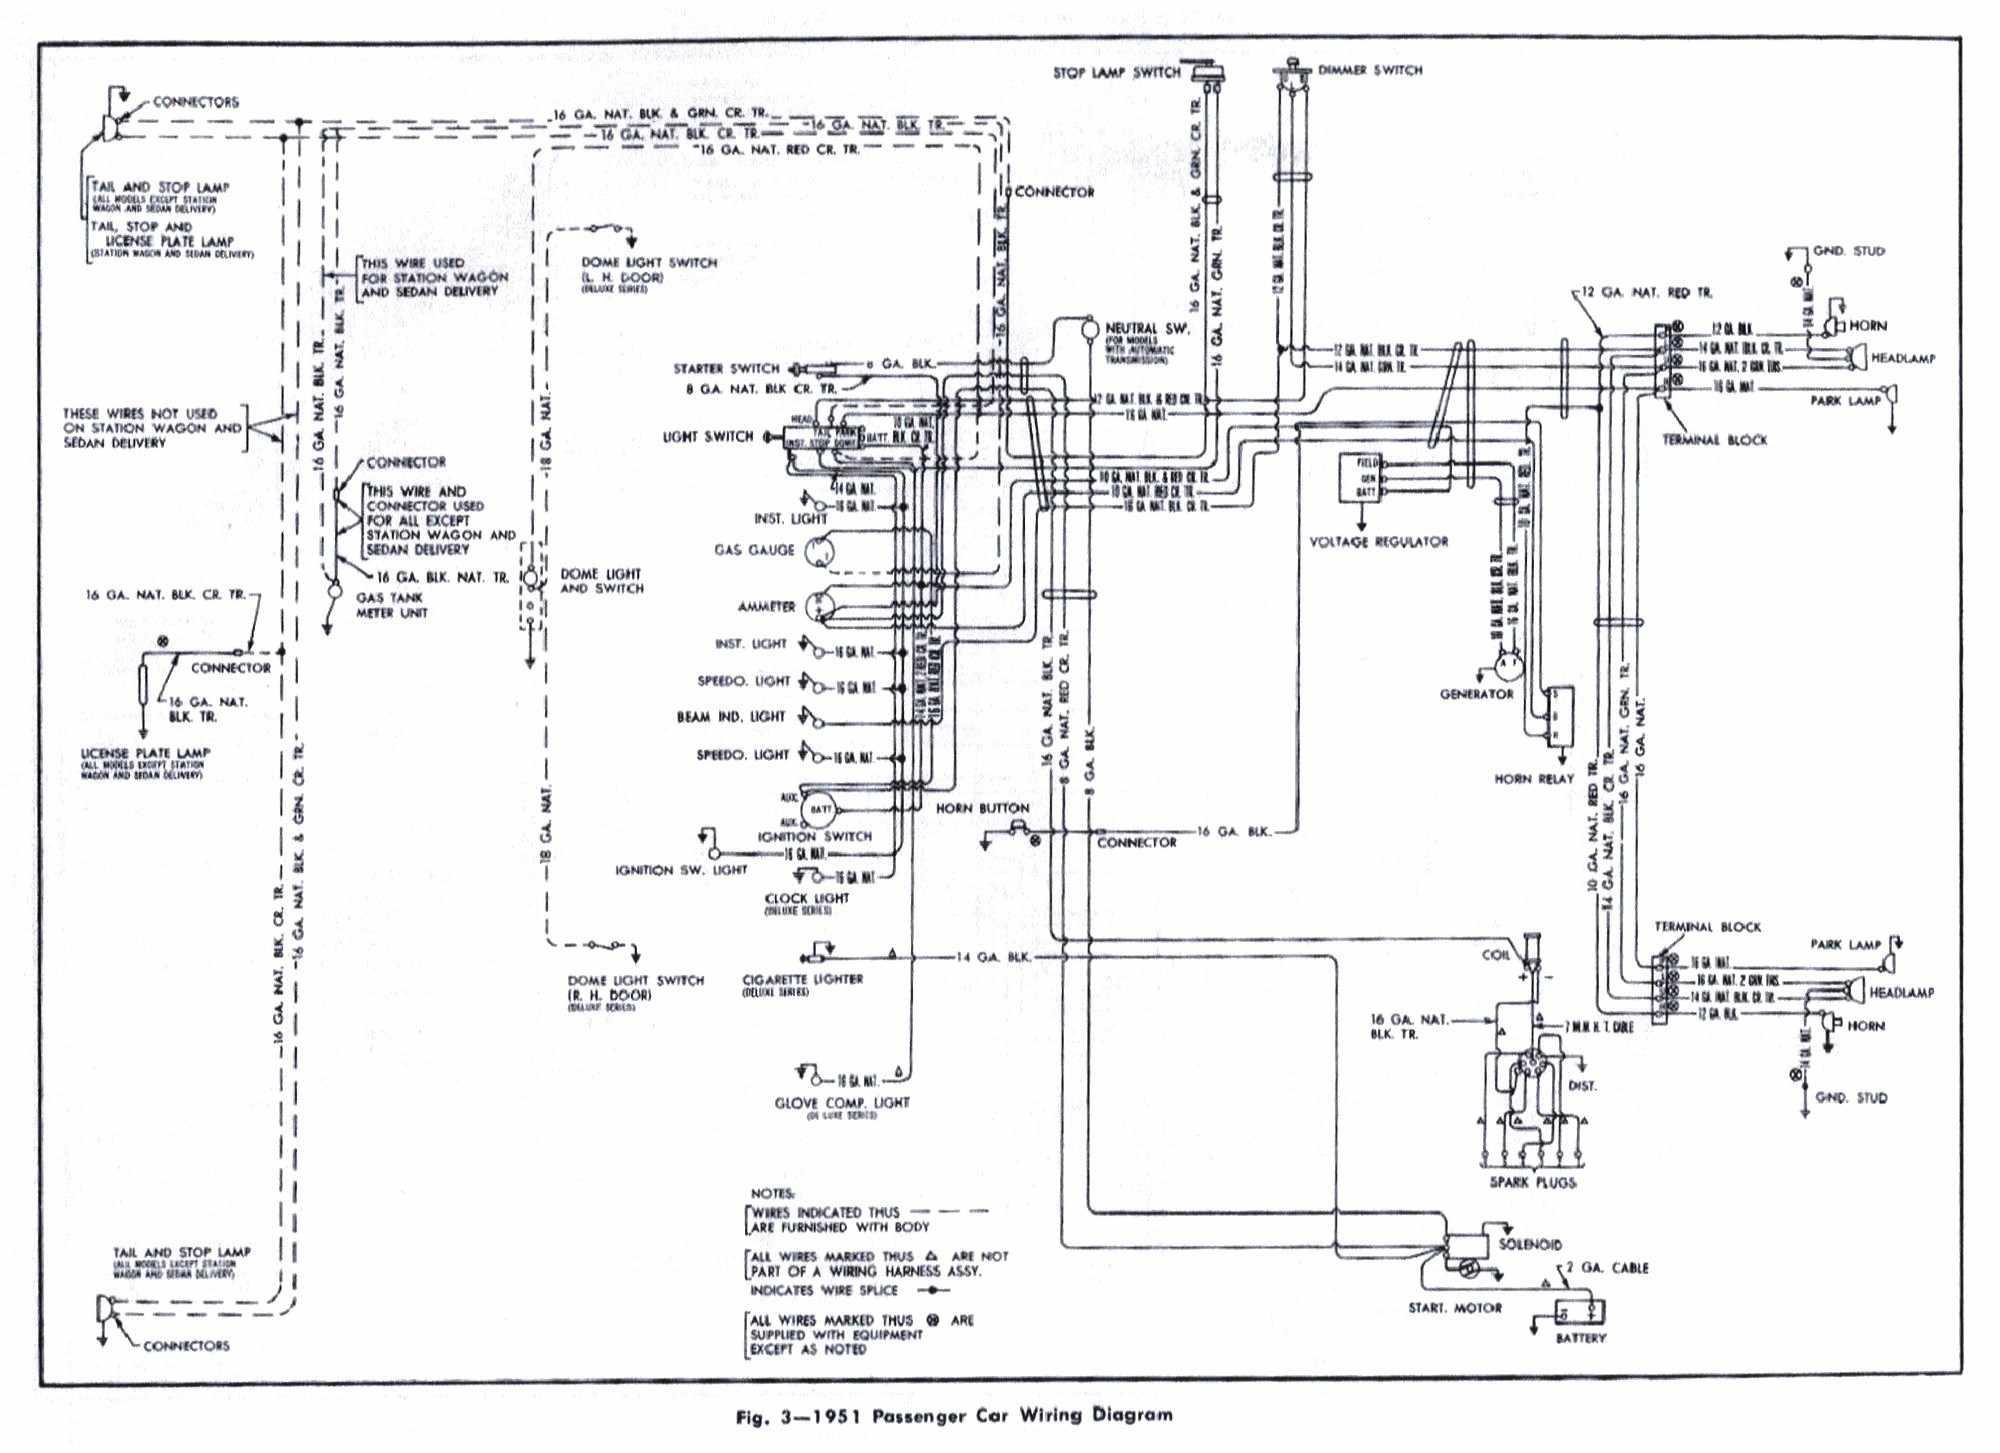 1986 Toyota Pickup Fuel Pump Electrical Diagram Mr2 Wiring